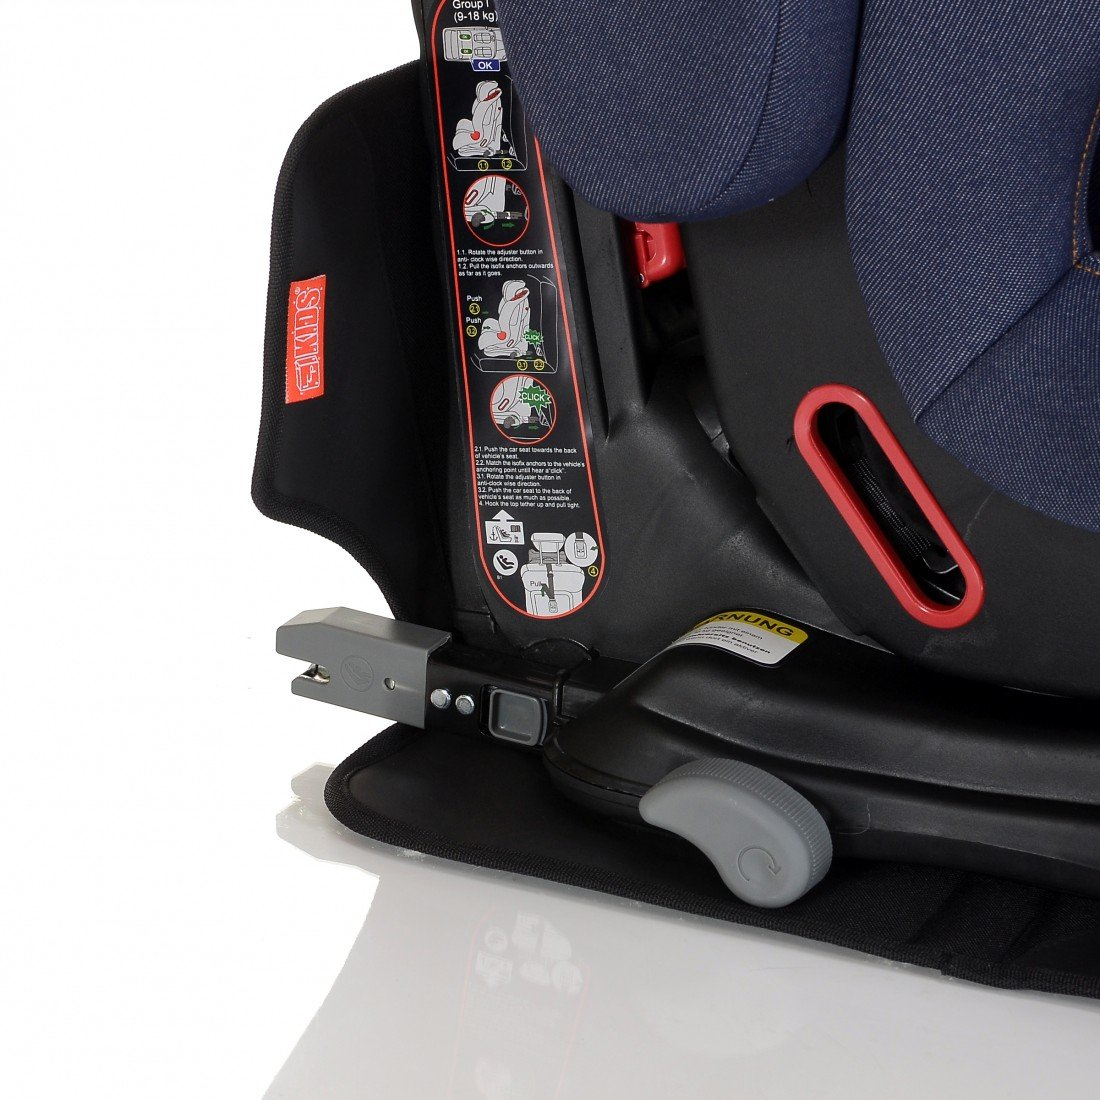 LCP Kids Protectores para silla de coche asiento infantil de coche coj/ín de protecci/ón